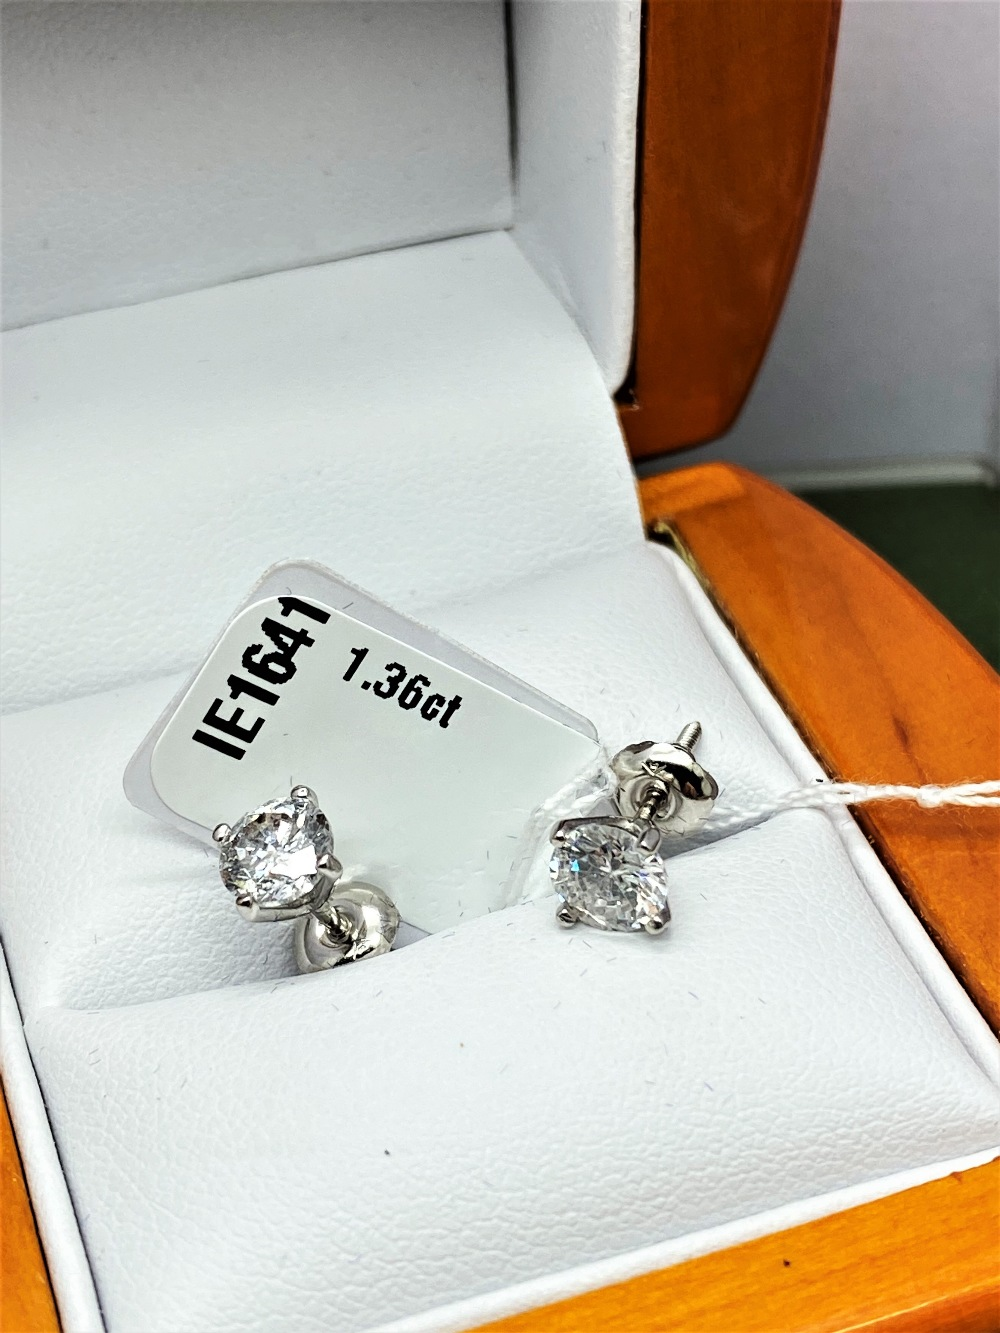 Pair of New 1.36 Carat Round Cut VS1/D Diamond Stud Earrings On 14K Hallmarked White Gold - Image 2 of 7